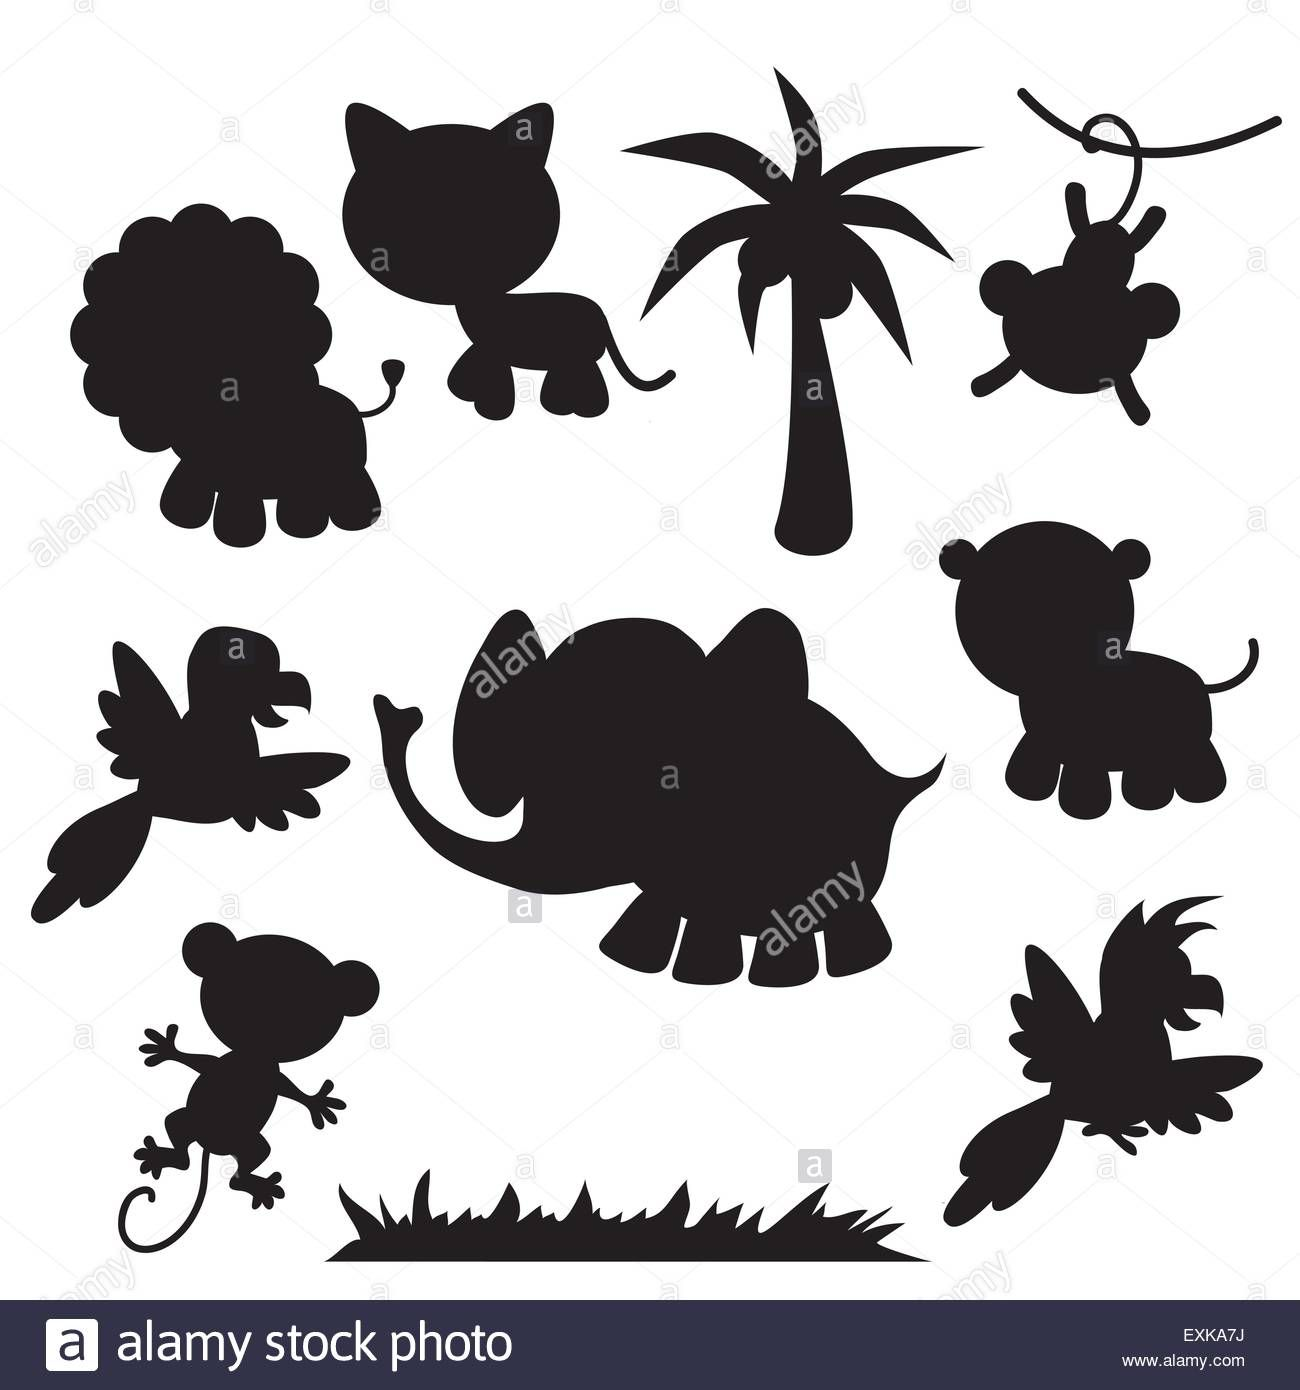 Stock Vector Lion Lioness Elephant Parrot Palm Tree Monkey Cute Animal Jungle Animal Funny Vector Cartoon Jungle Animals Cartoon Illustration Jungle Animals